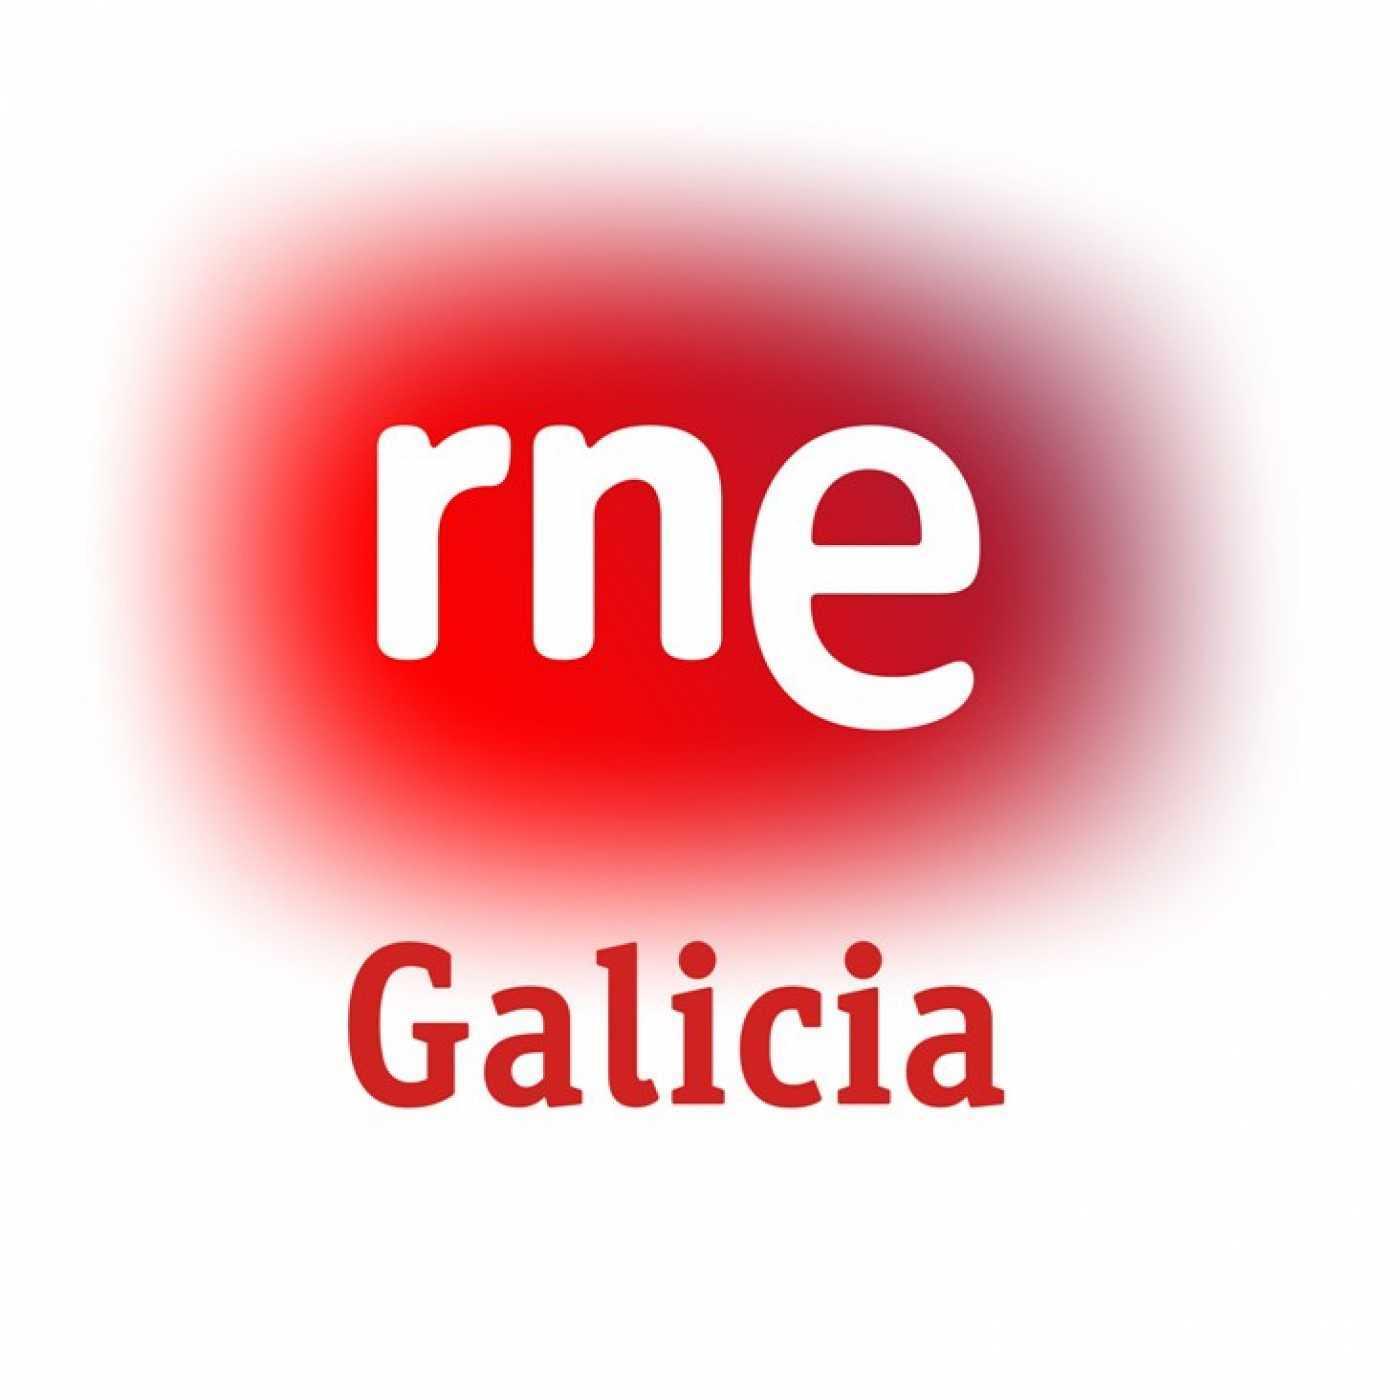 Informativo Galicia 7:45 - 21/10/20 - Escuchar ahora